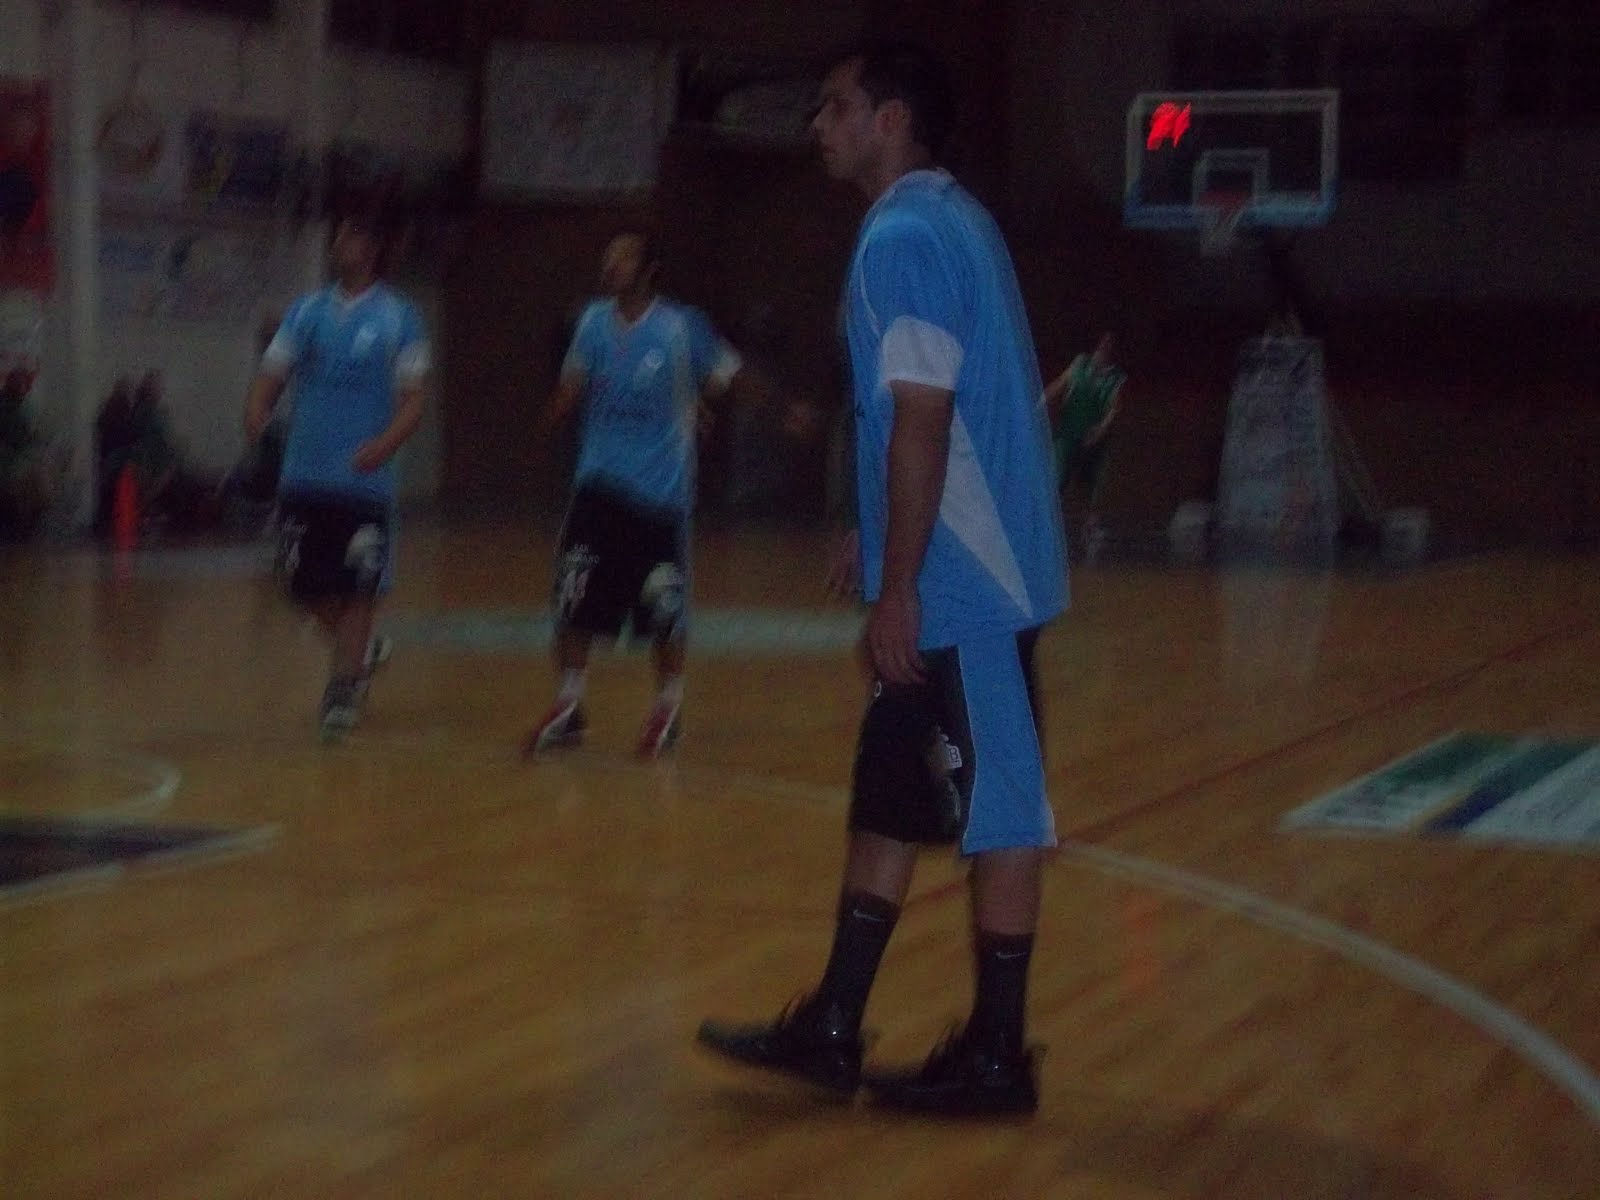 Deporte en freyre basquet vapuleado for Comedor 9 de julio freyre